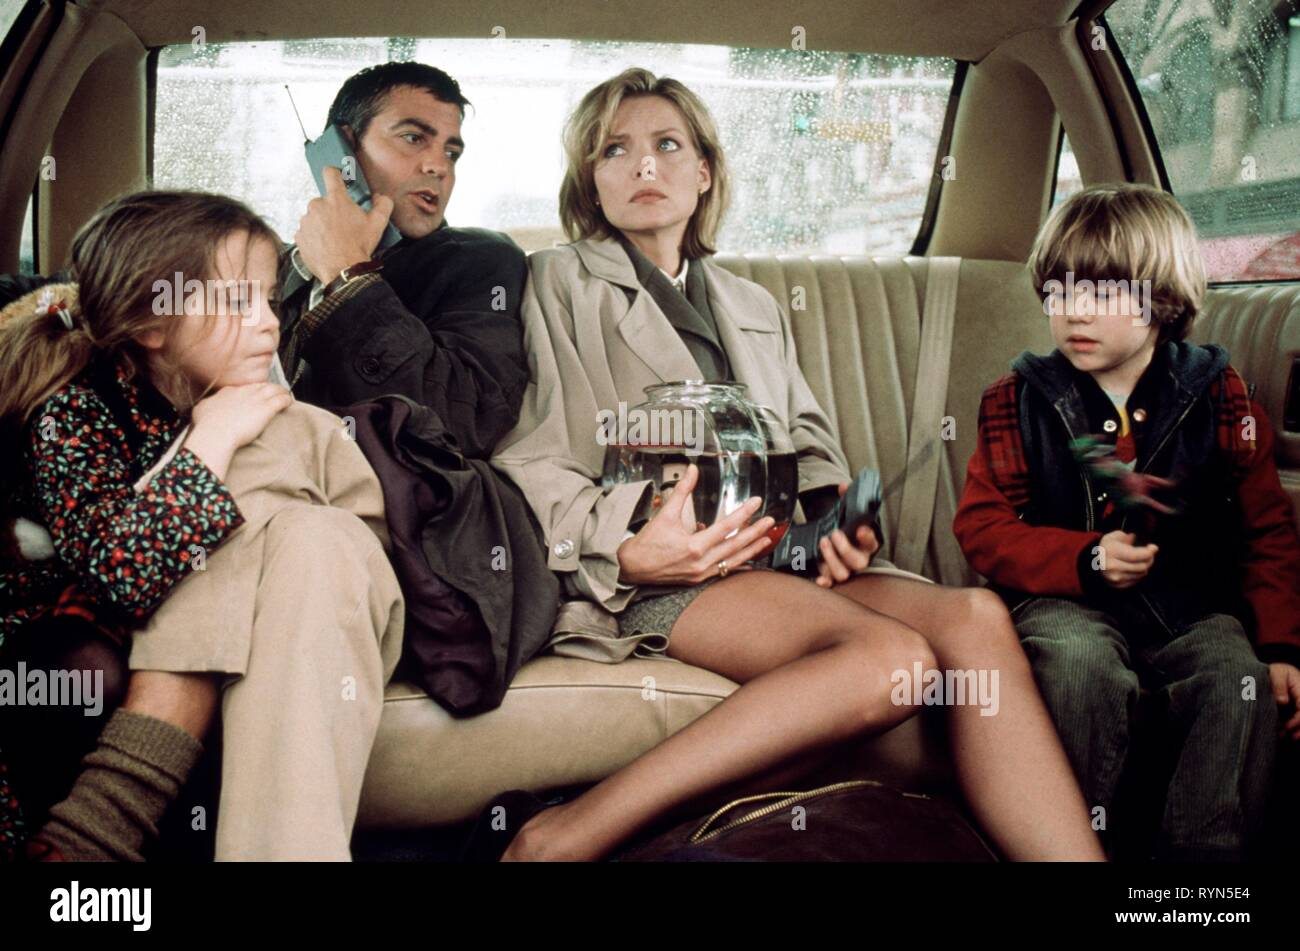 WHITMAN,CLOONEY,PFEIFFER,LINZ, ONE FINE DAY, 1996 Stock Photo